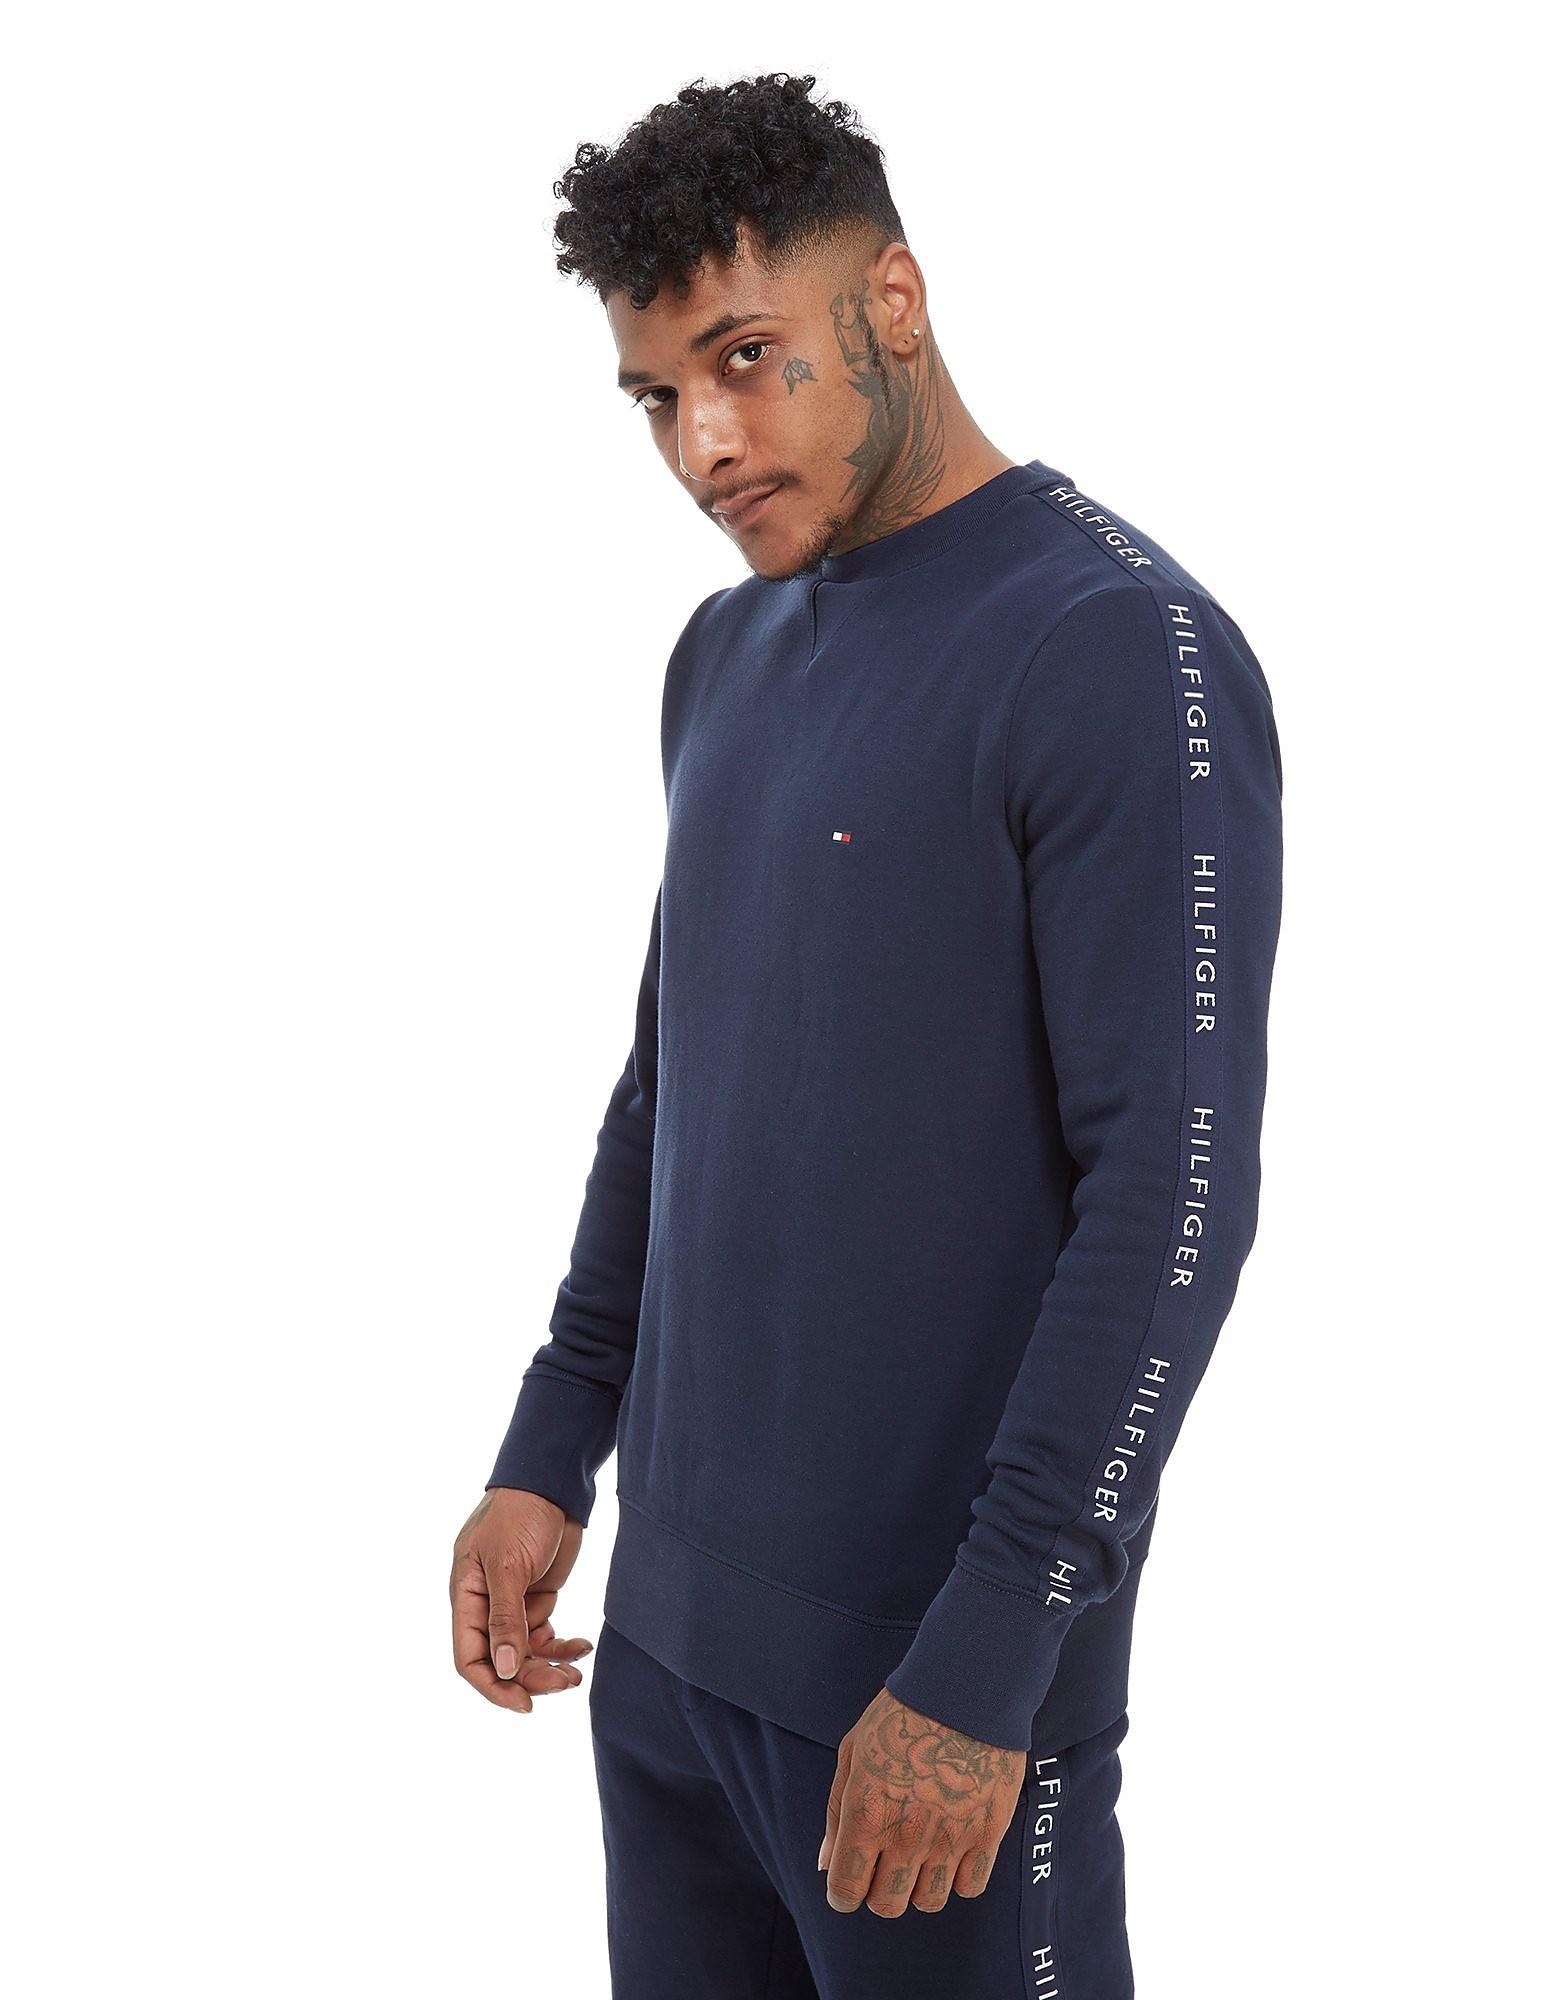 Tommy Hilfiger Side Tape Crew Long Sleeve Sweatshirt